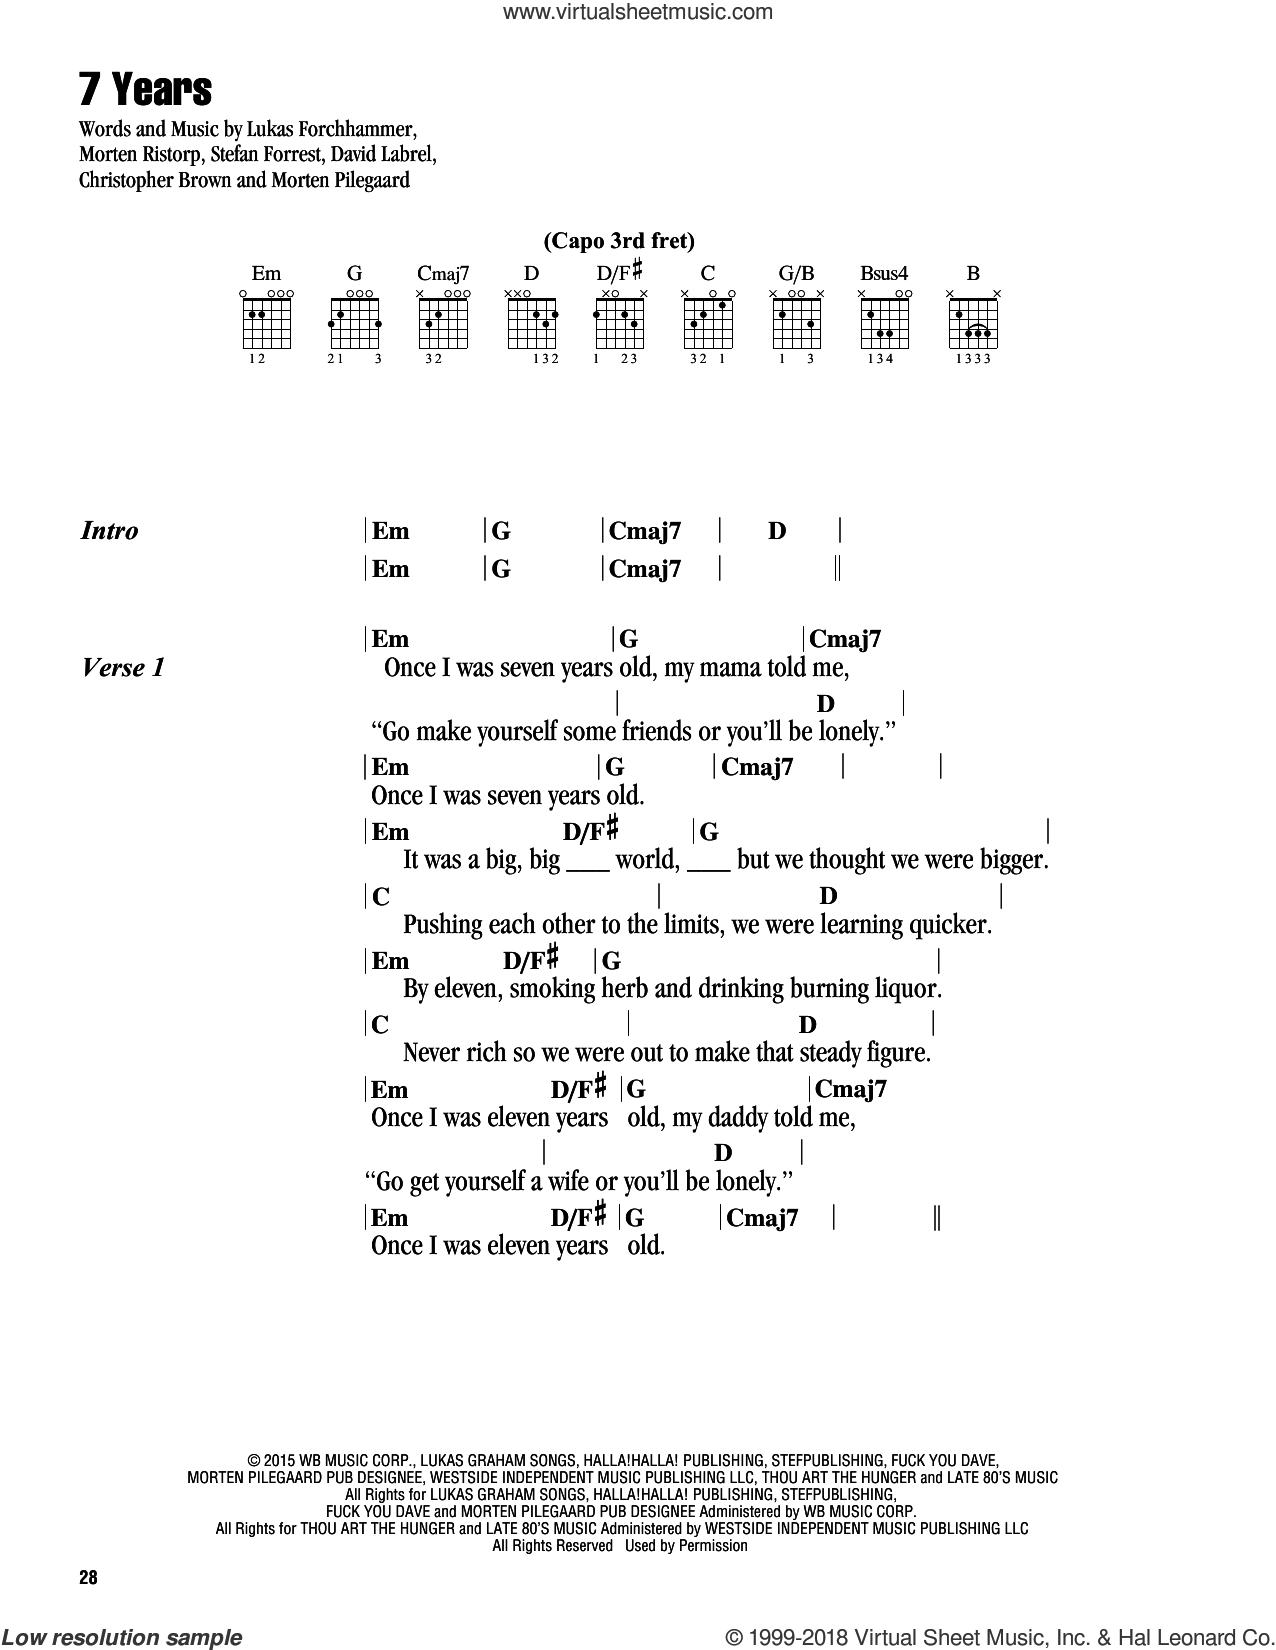 7 Years sheet music for guitar (chords) by Lukas Graham, Chris Brown, David Labrel, Lukas Forchhammer, Morten Pilegaard, Morten Ristorp and Stefan Forrest, intermediate skill level